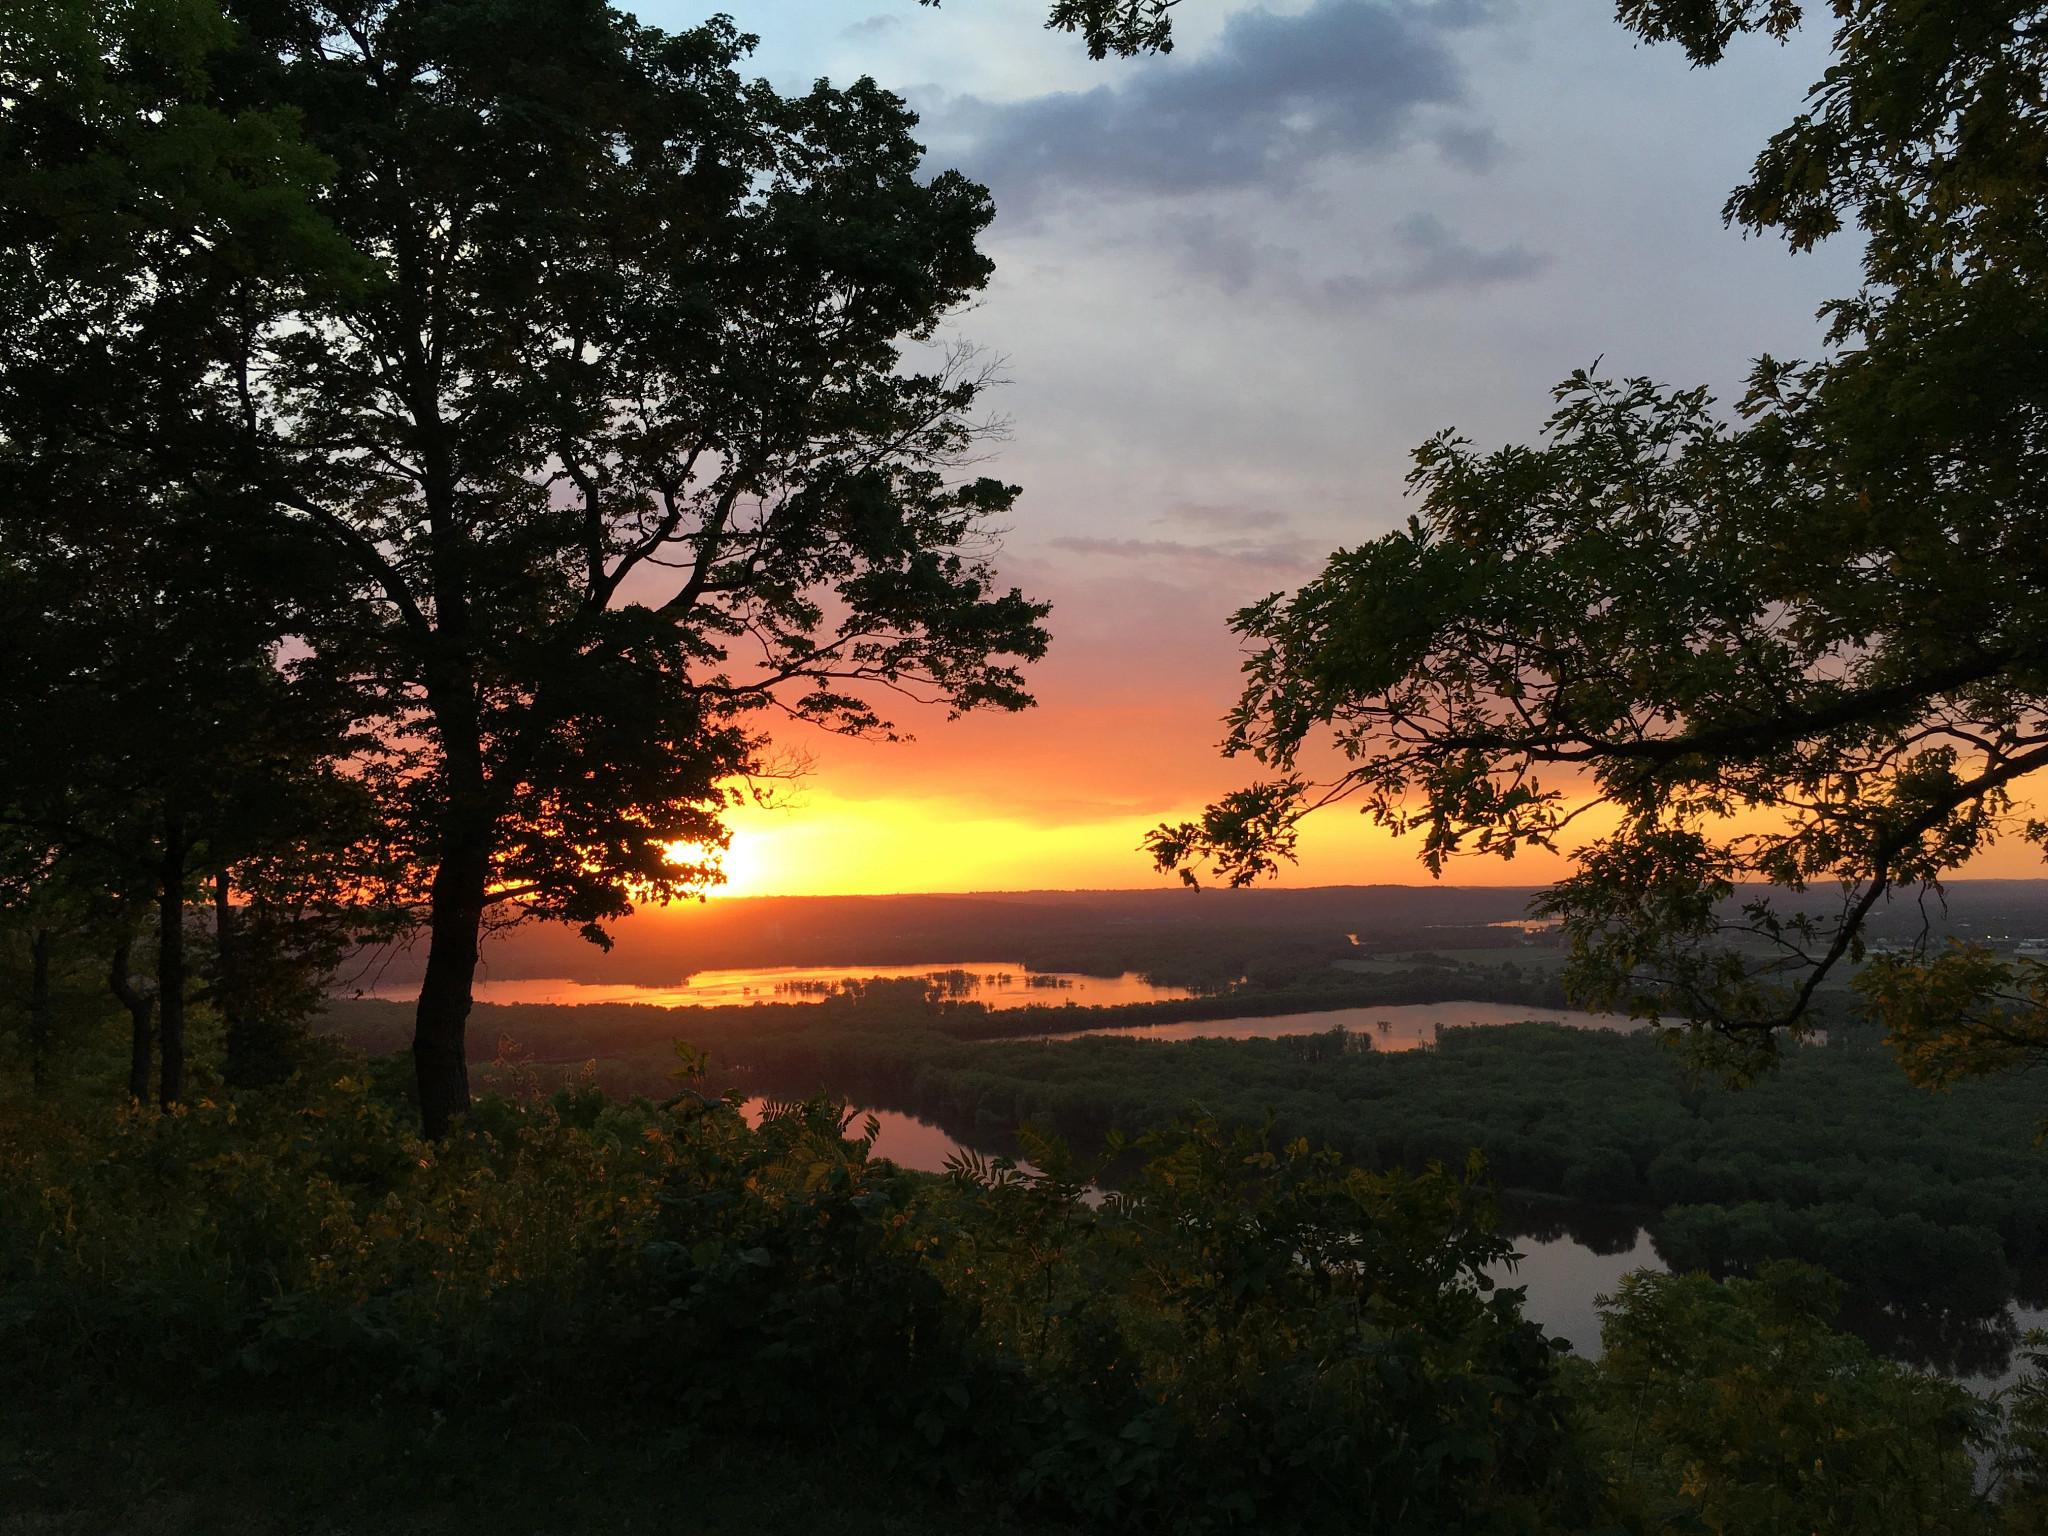 landscape photo of sunset over Wyalusing State Park